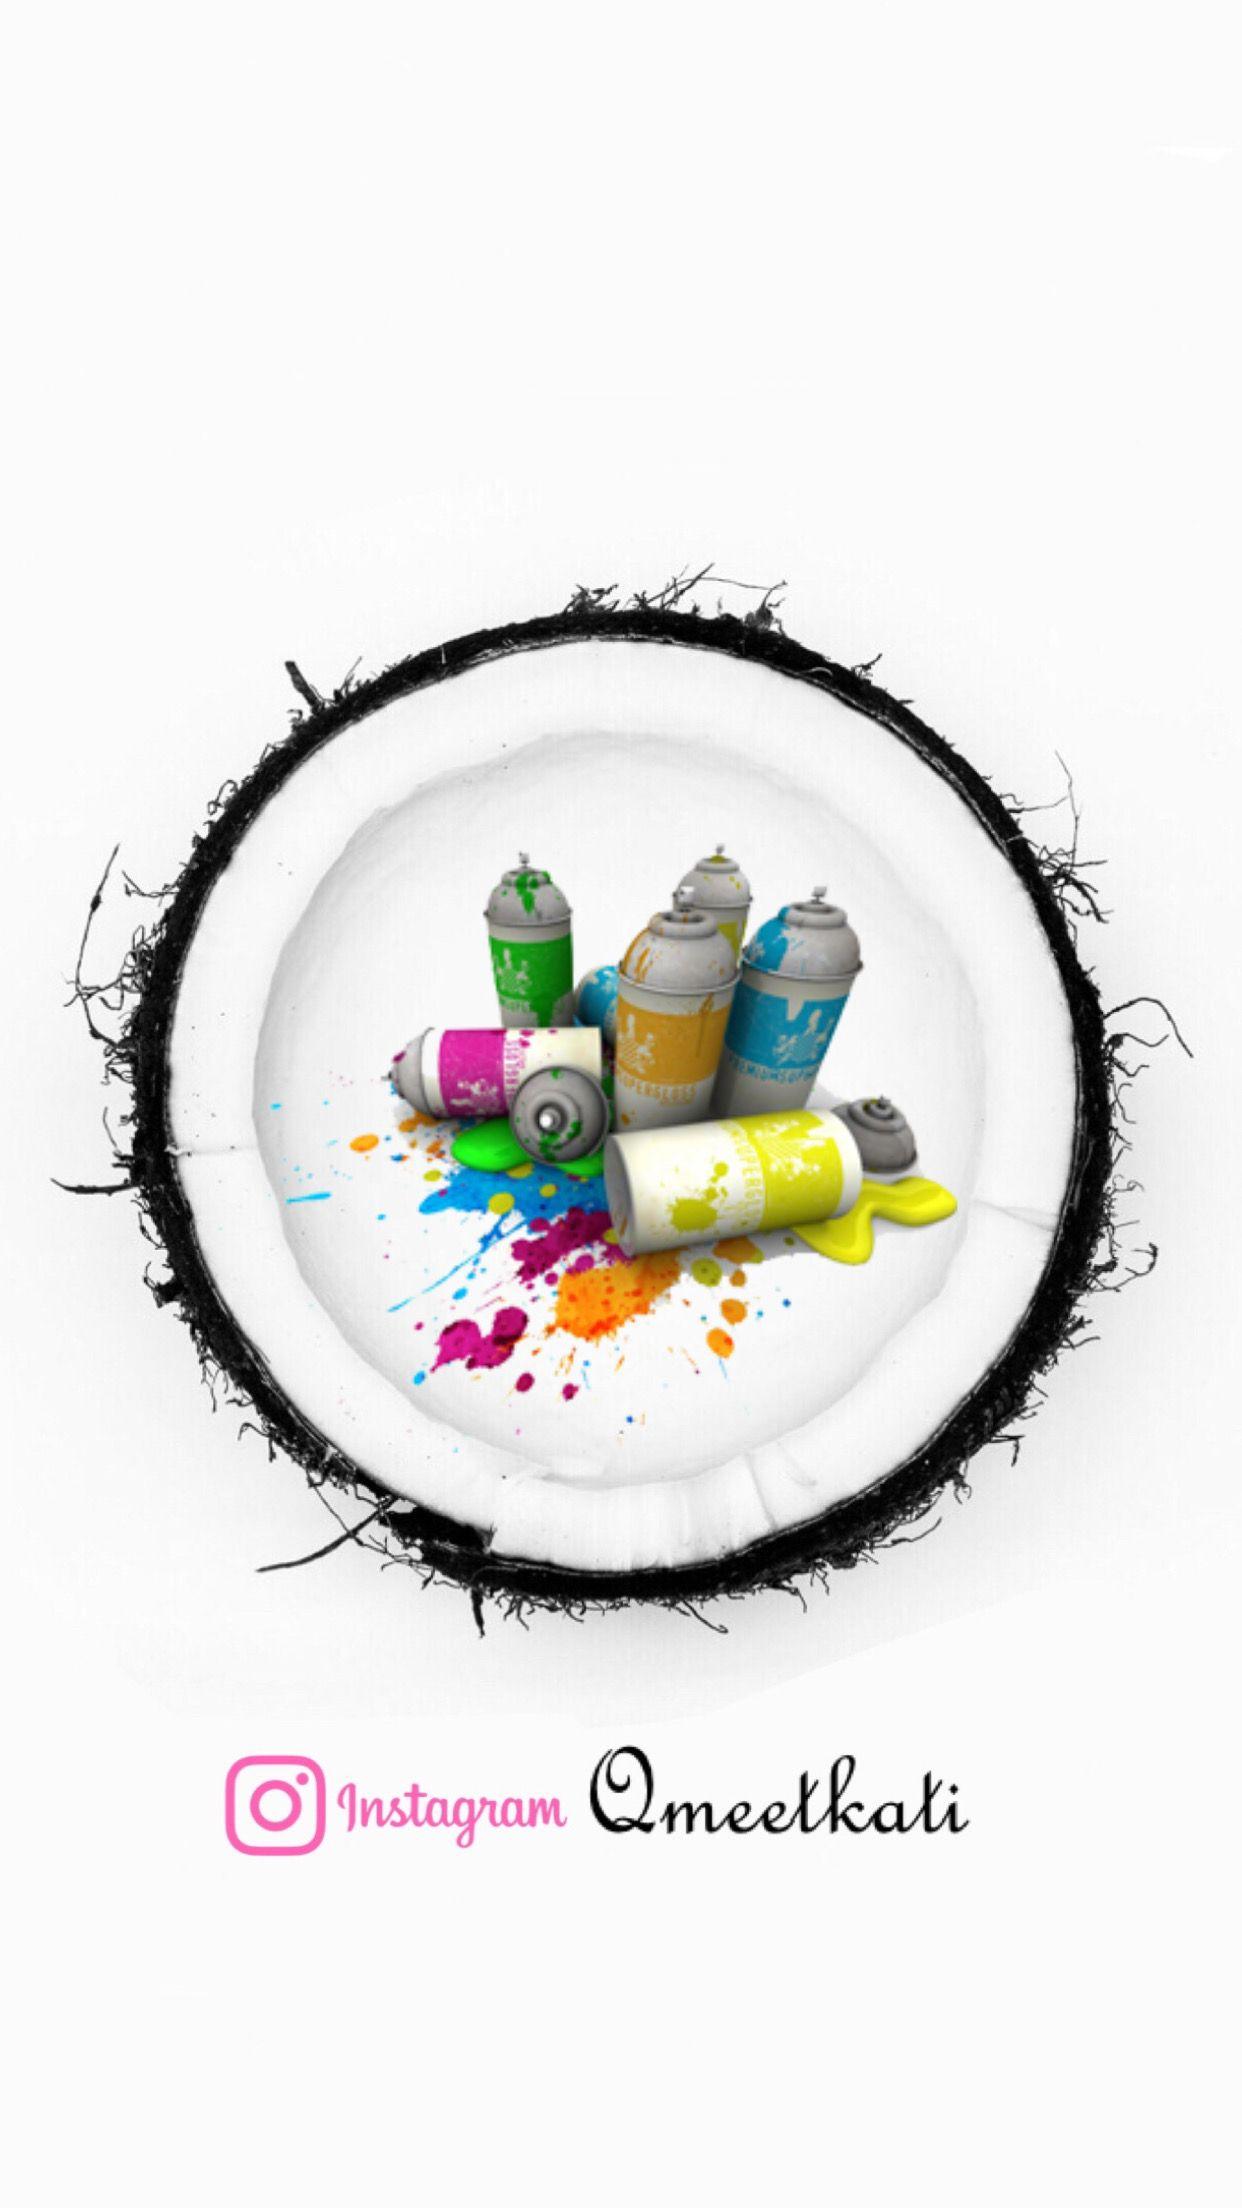 graffiti graffitiart graffitiwall icon icondesign